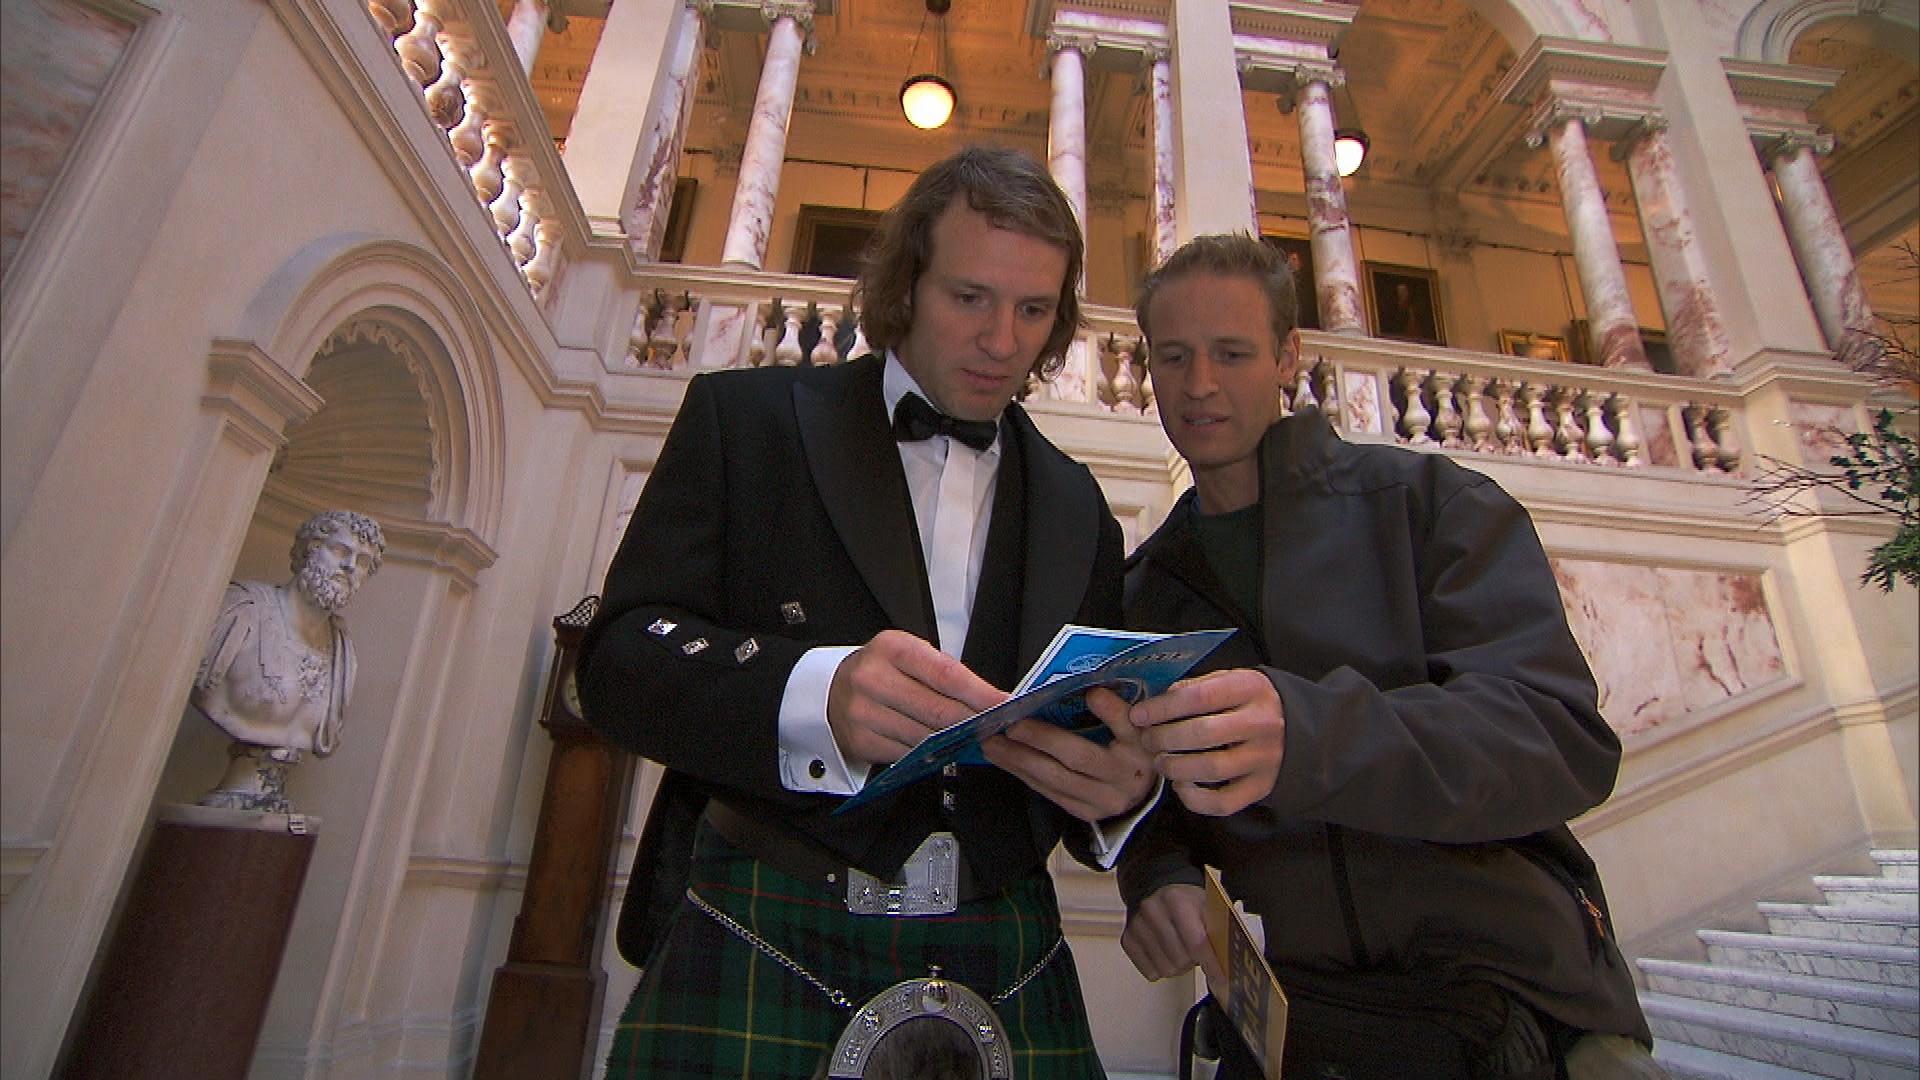 Dressed in Scottish attire in